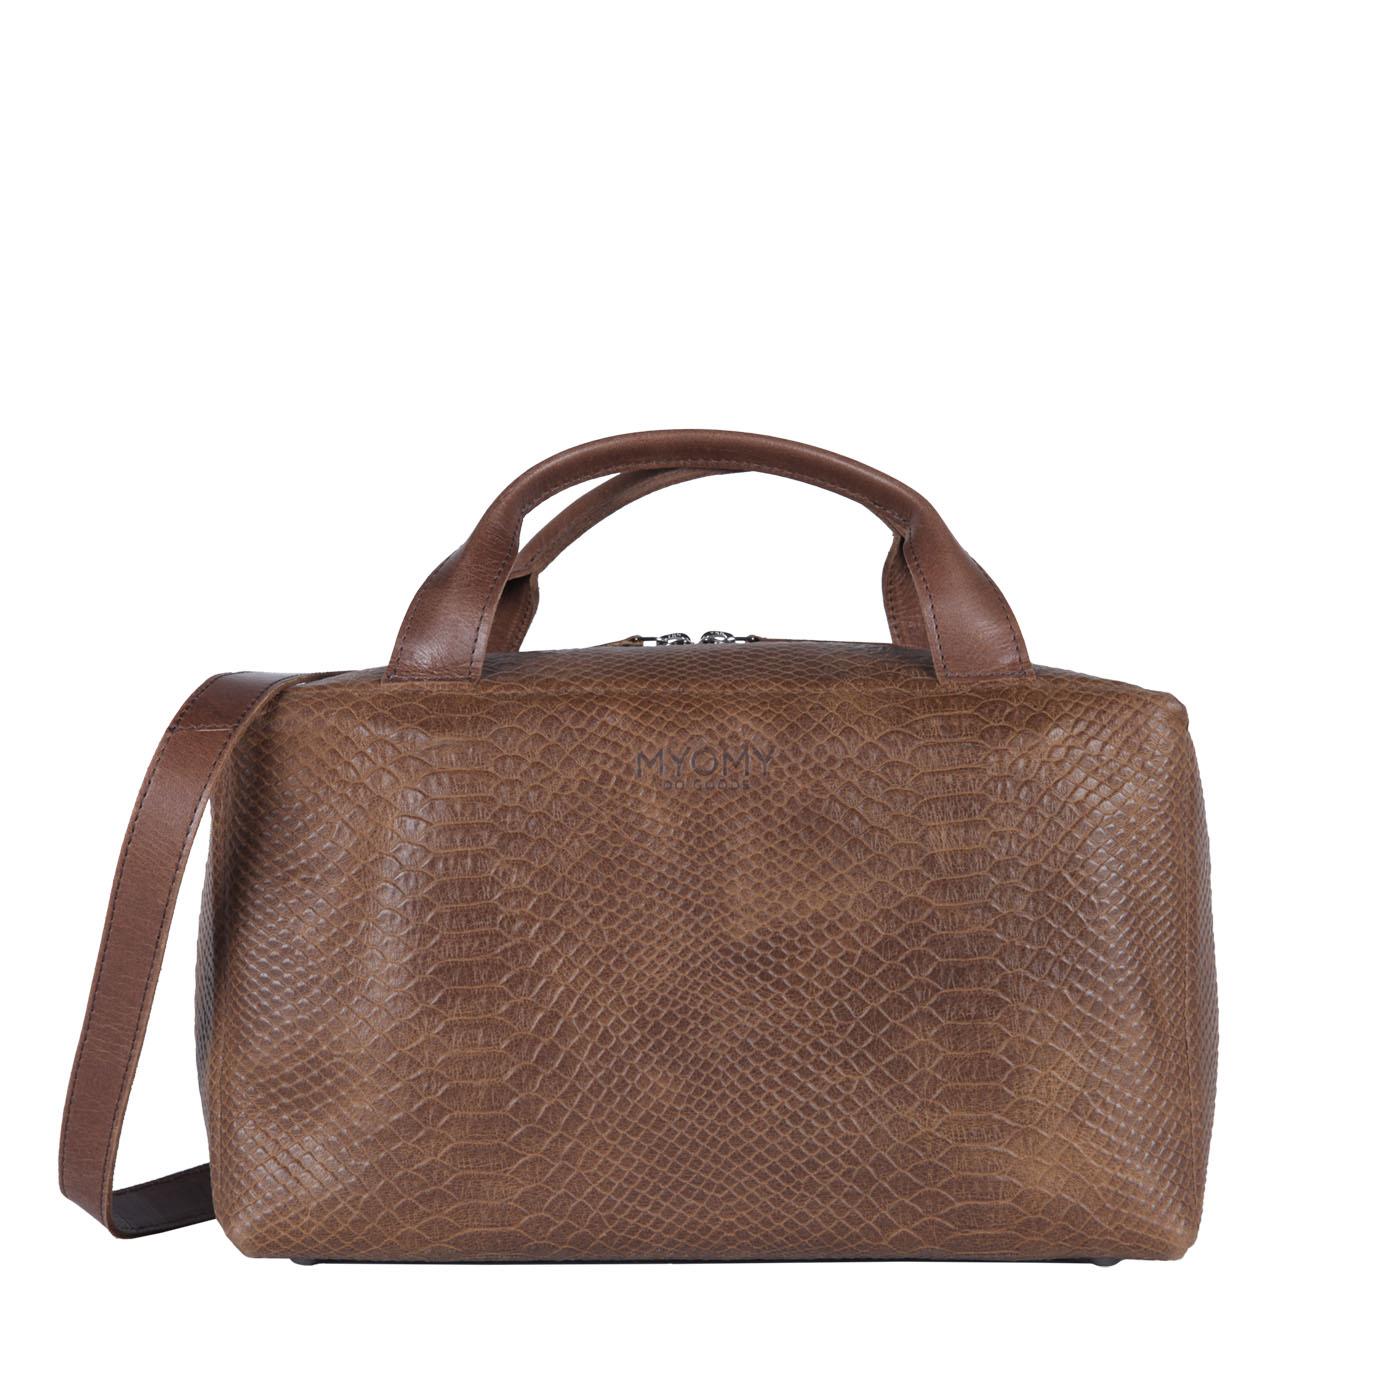 MY BOXY BAG Workbag - mix anaconda & hunter waxy original